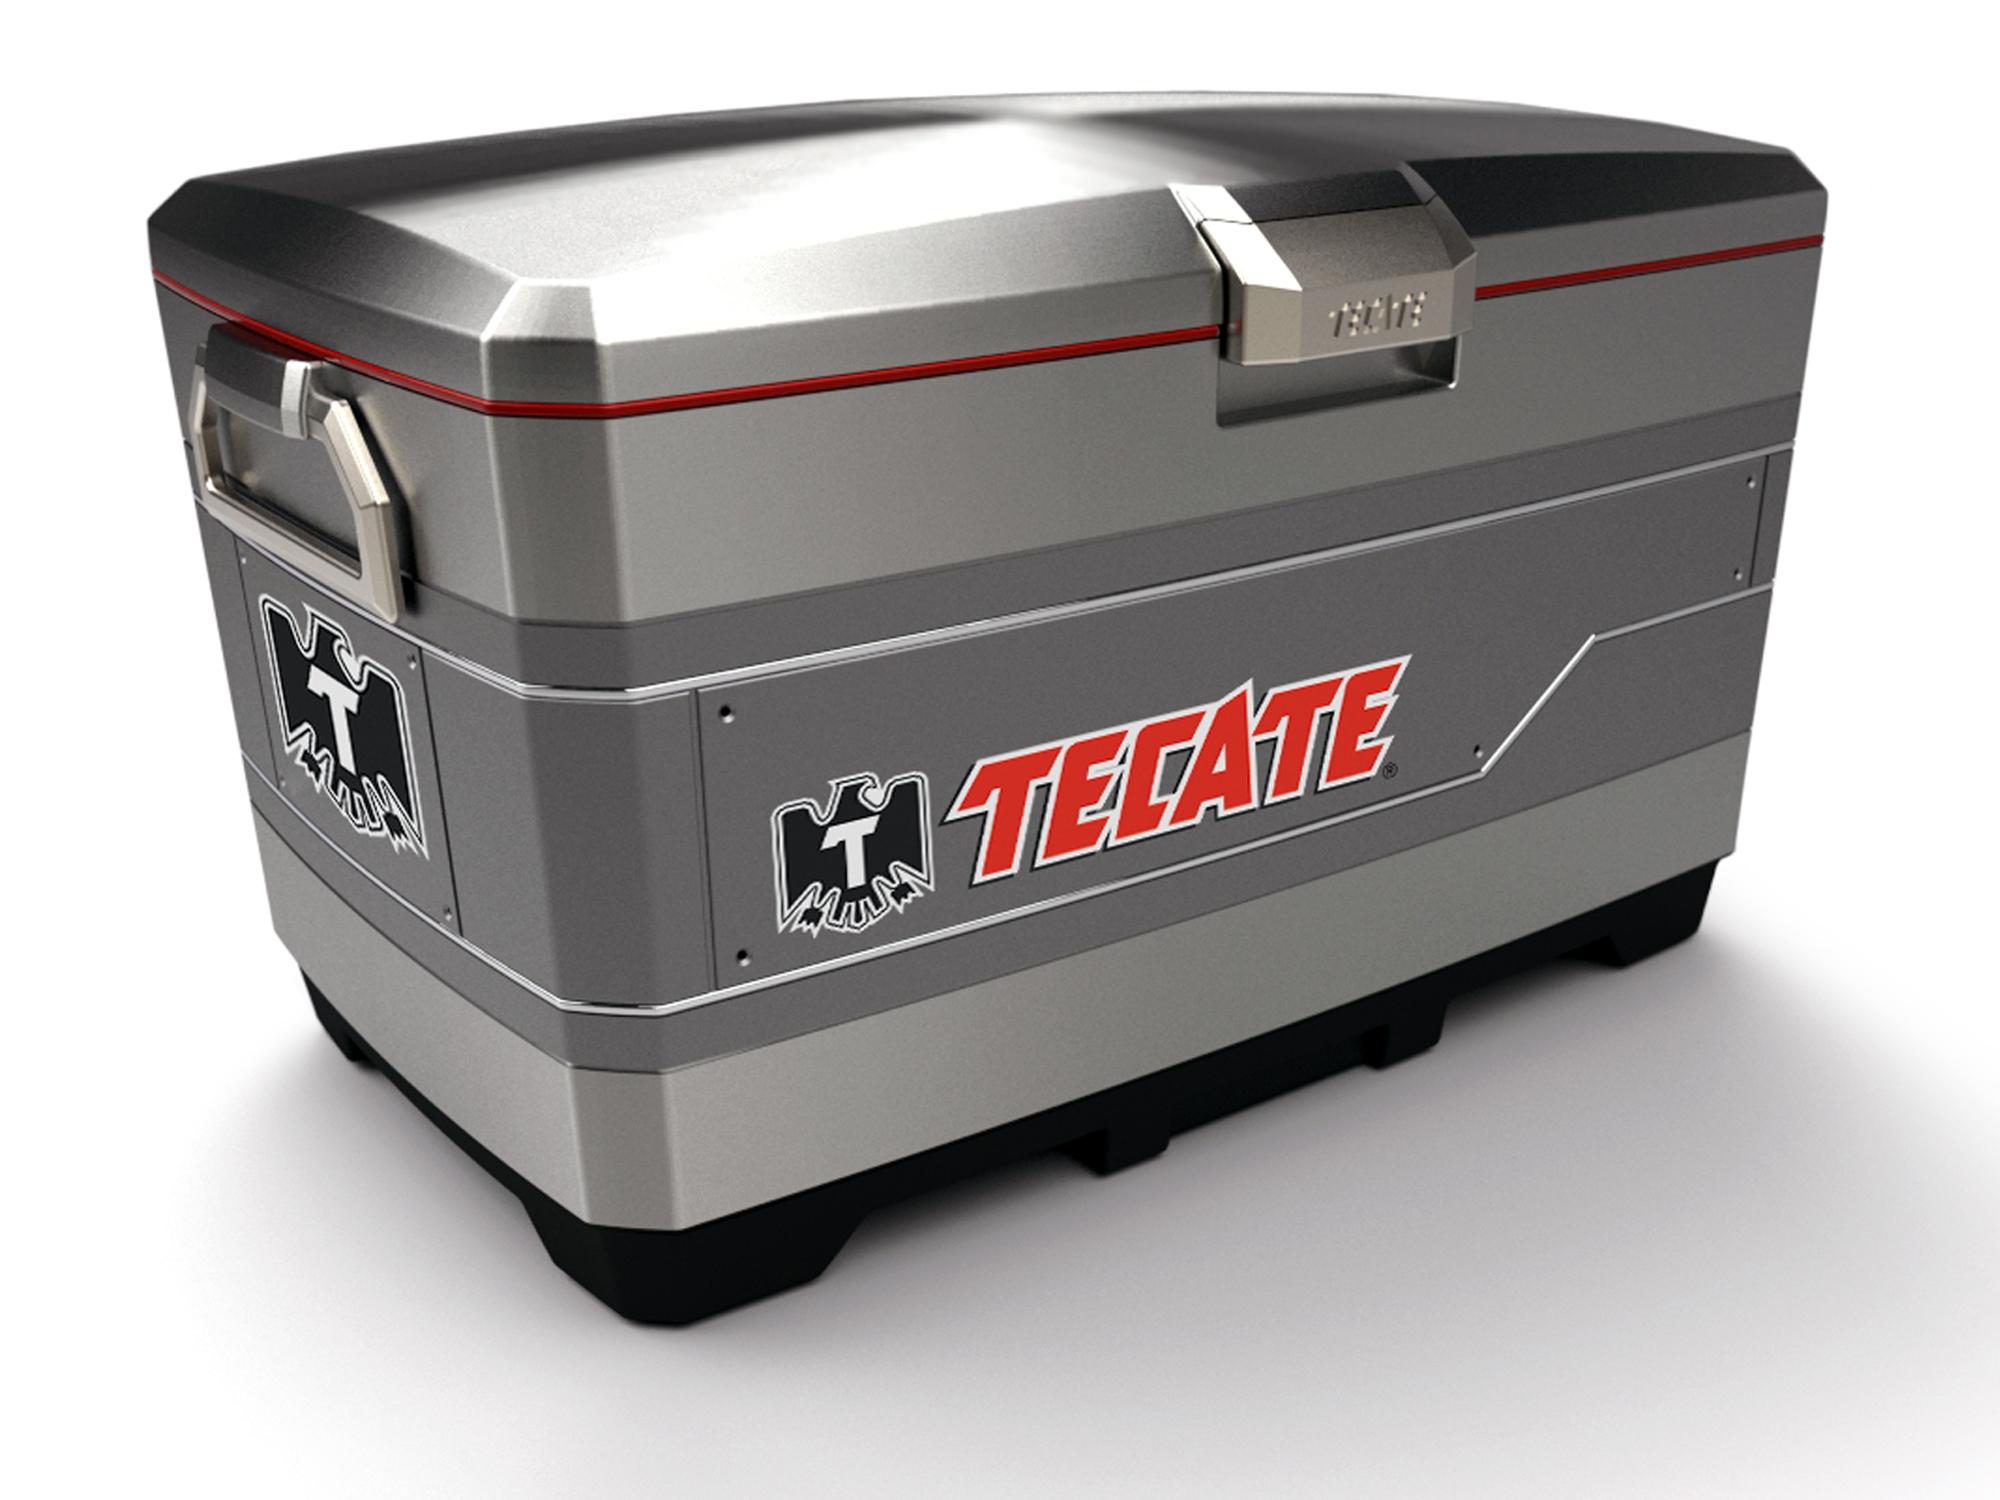 RUBBERMAID     Tecate Cooler